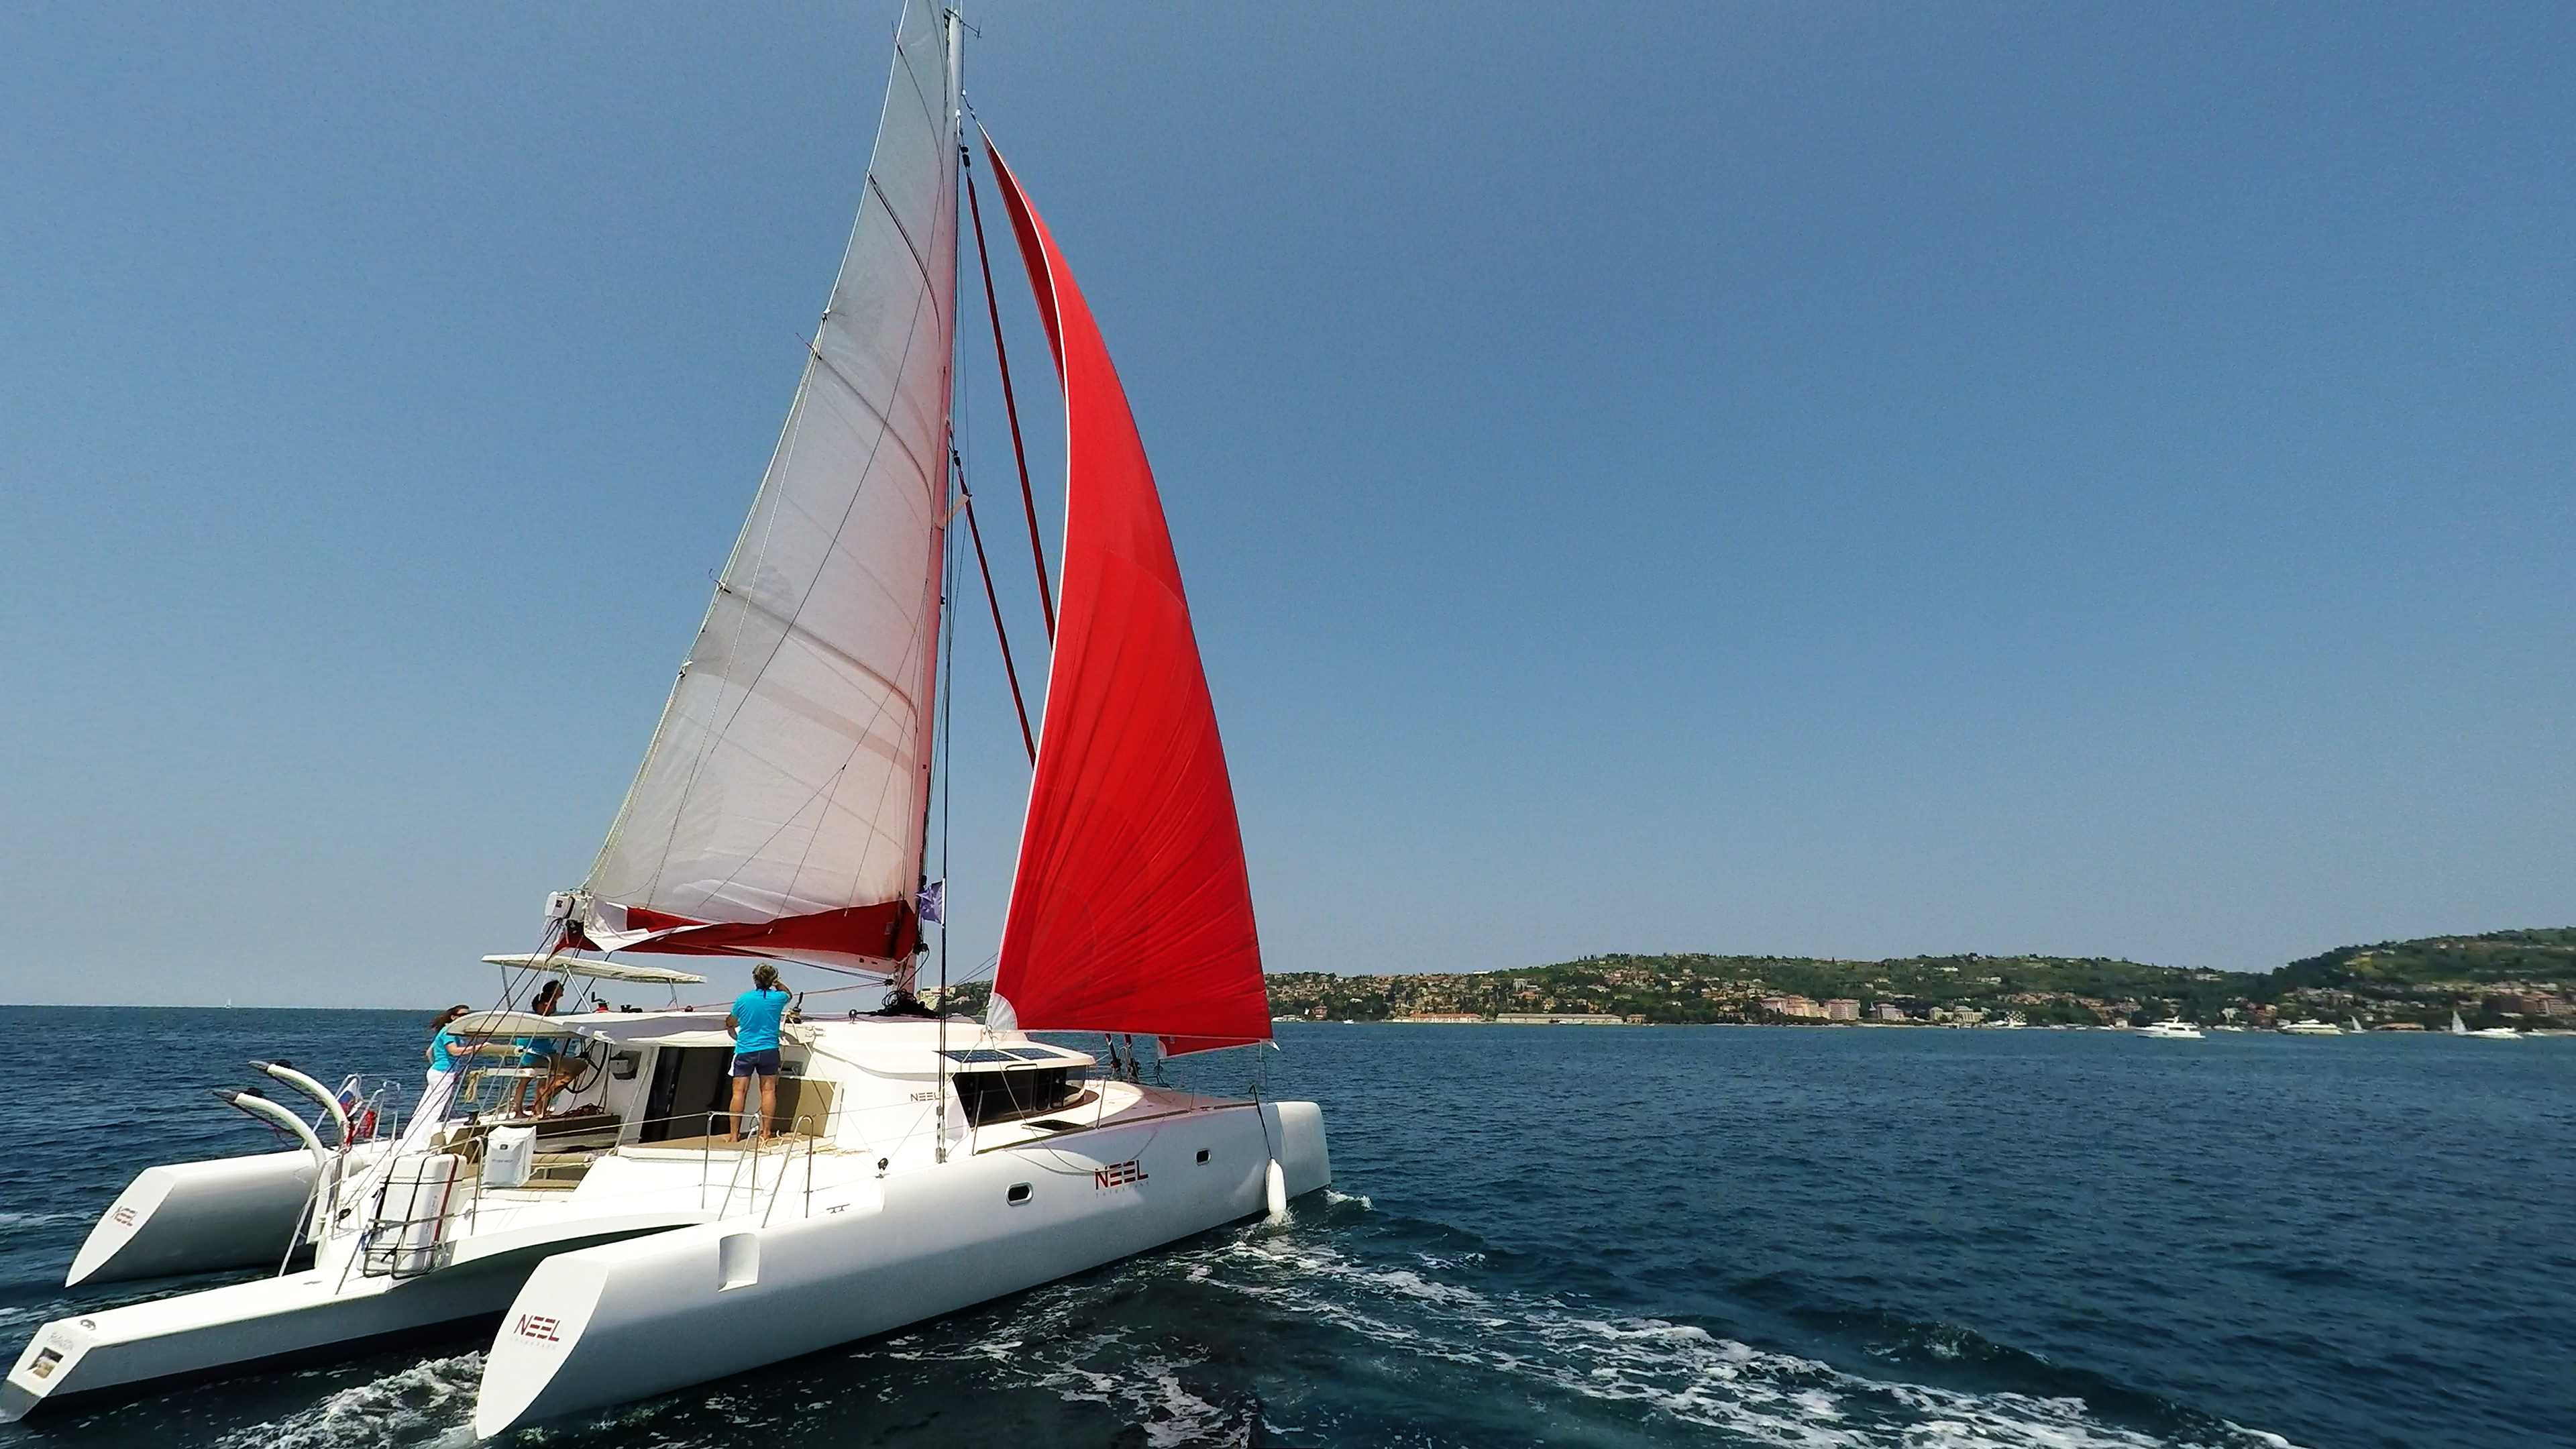 multiscafo barca a vela neel 45